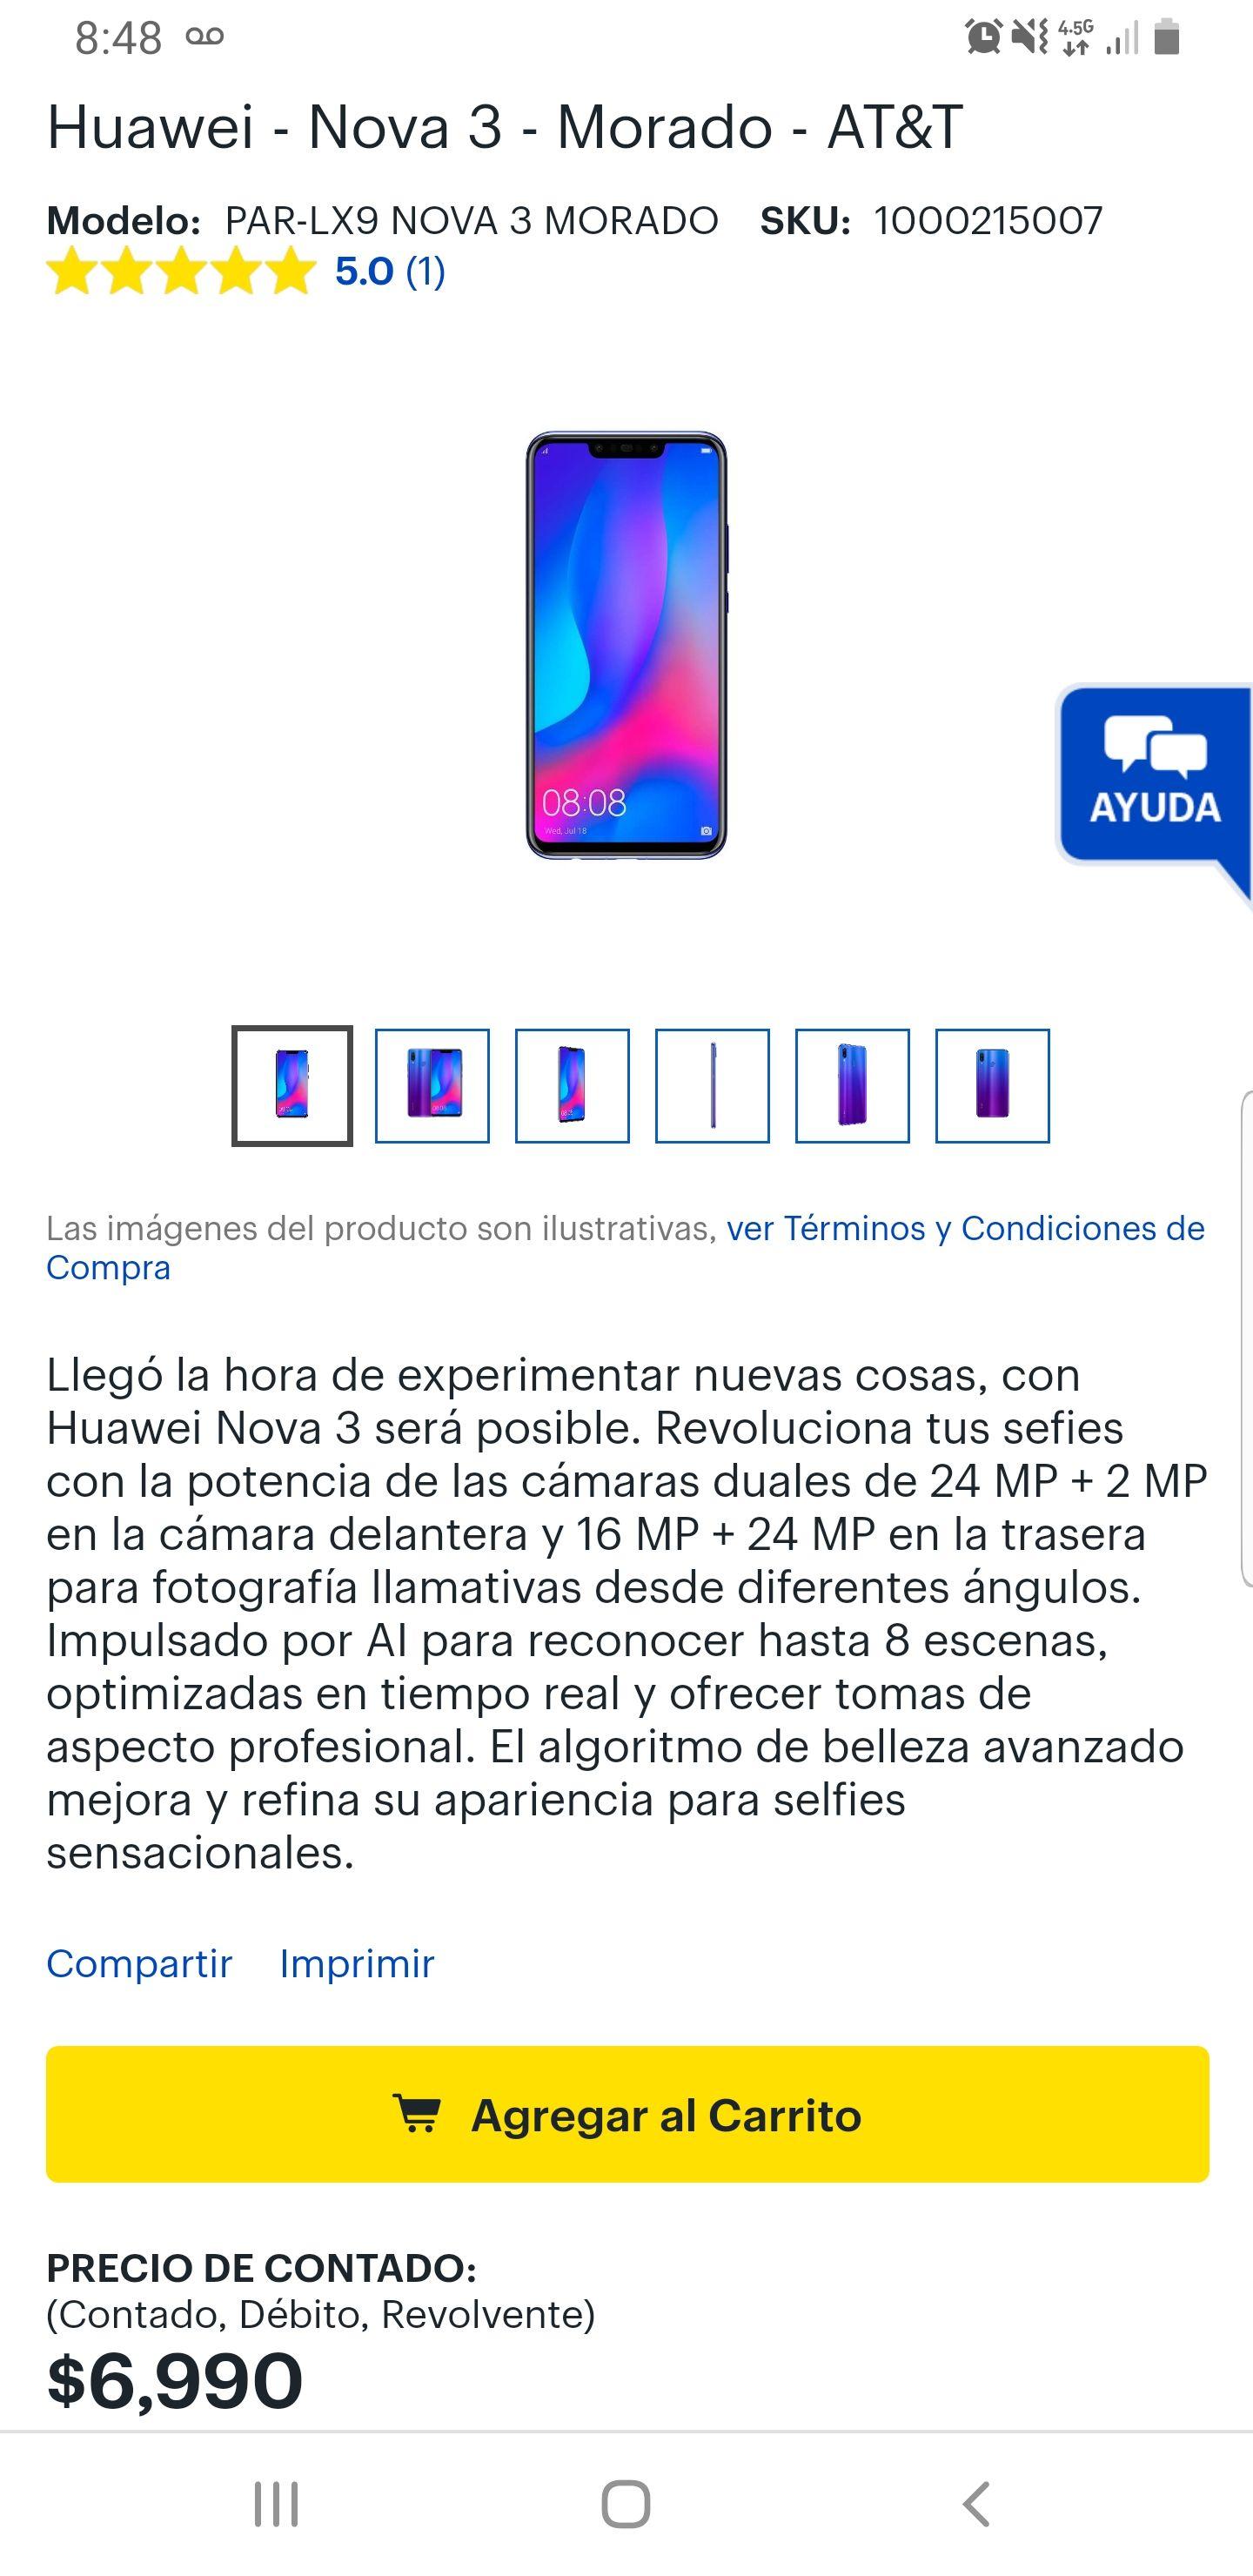 Best Buy Huawei Nova 3 + $600 en cupones + 12 meses sin intereses con Citi Banamex